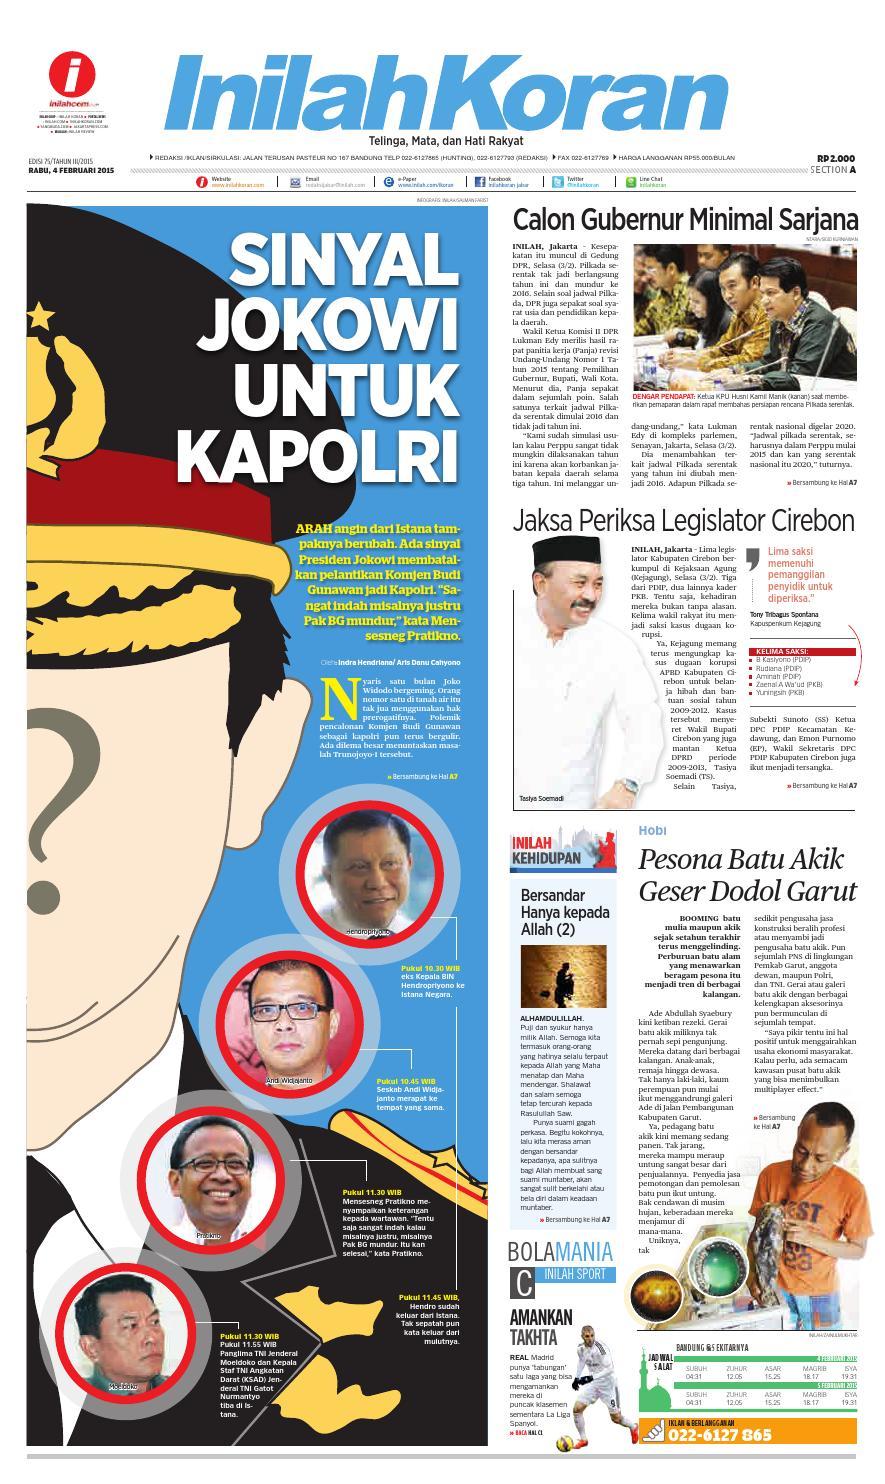 SINYAL JOKOWI UNTUK KAPOLRI by inilah koran - issuu 7e8e22e8c9